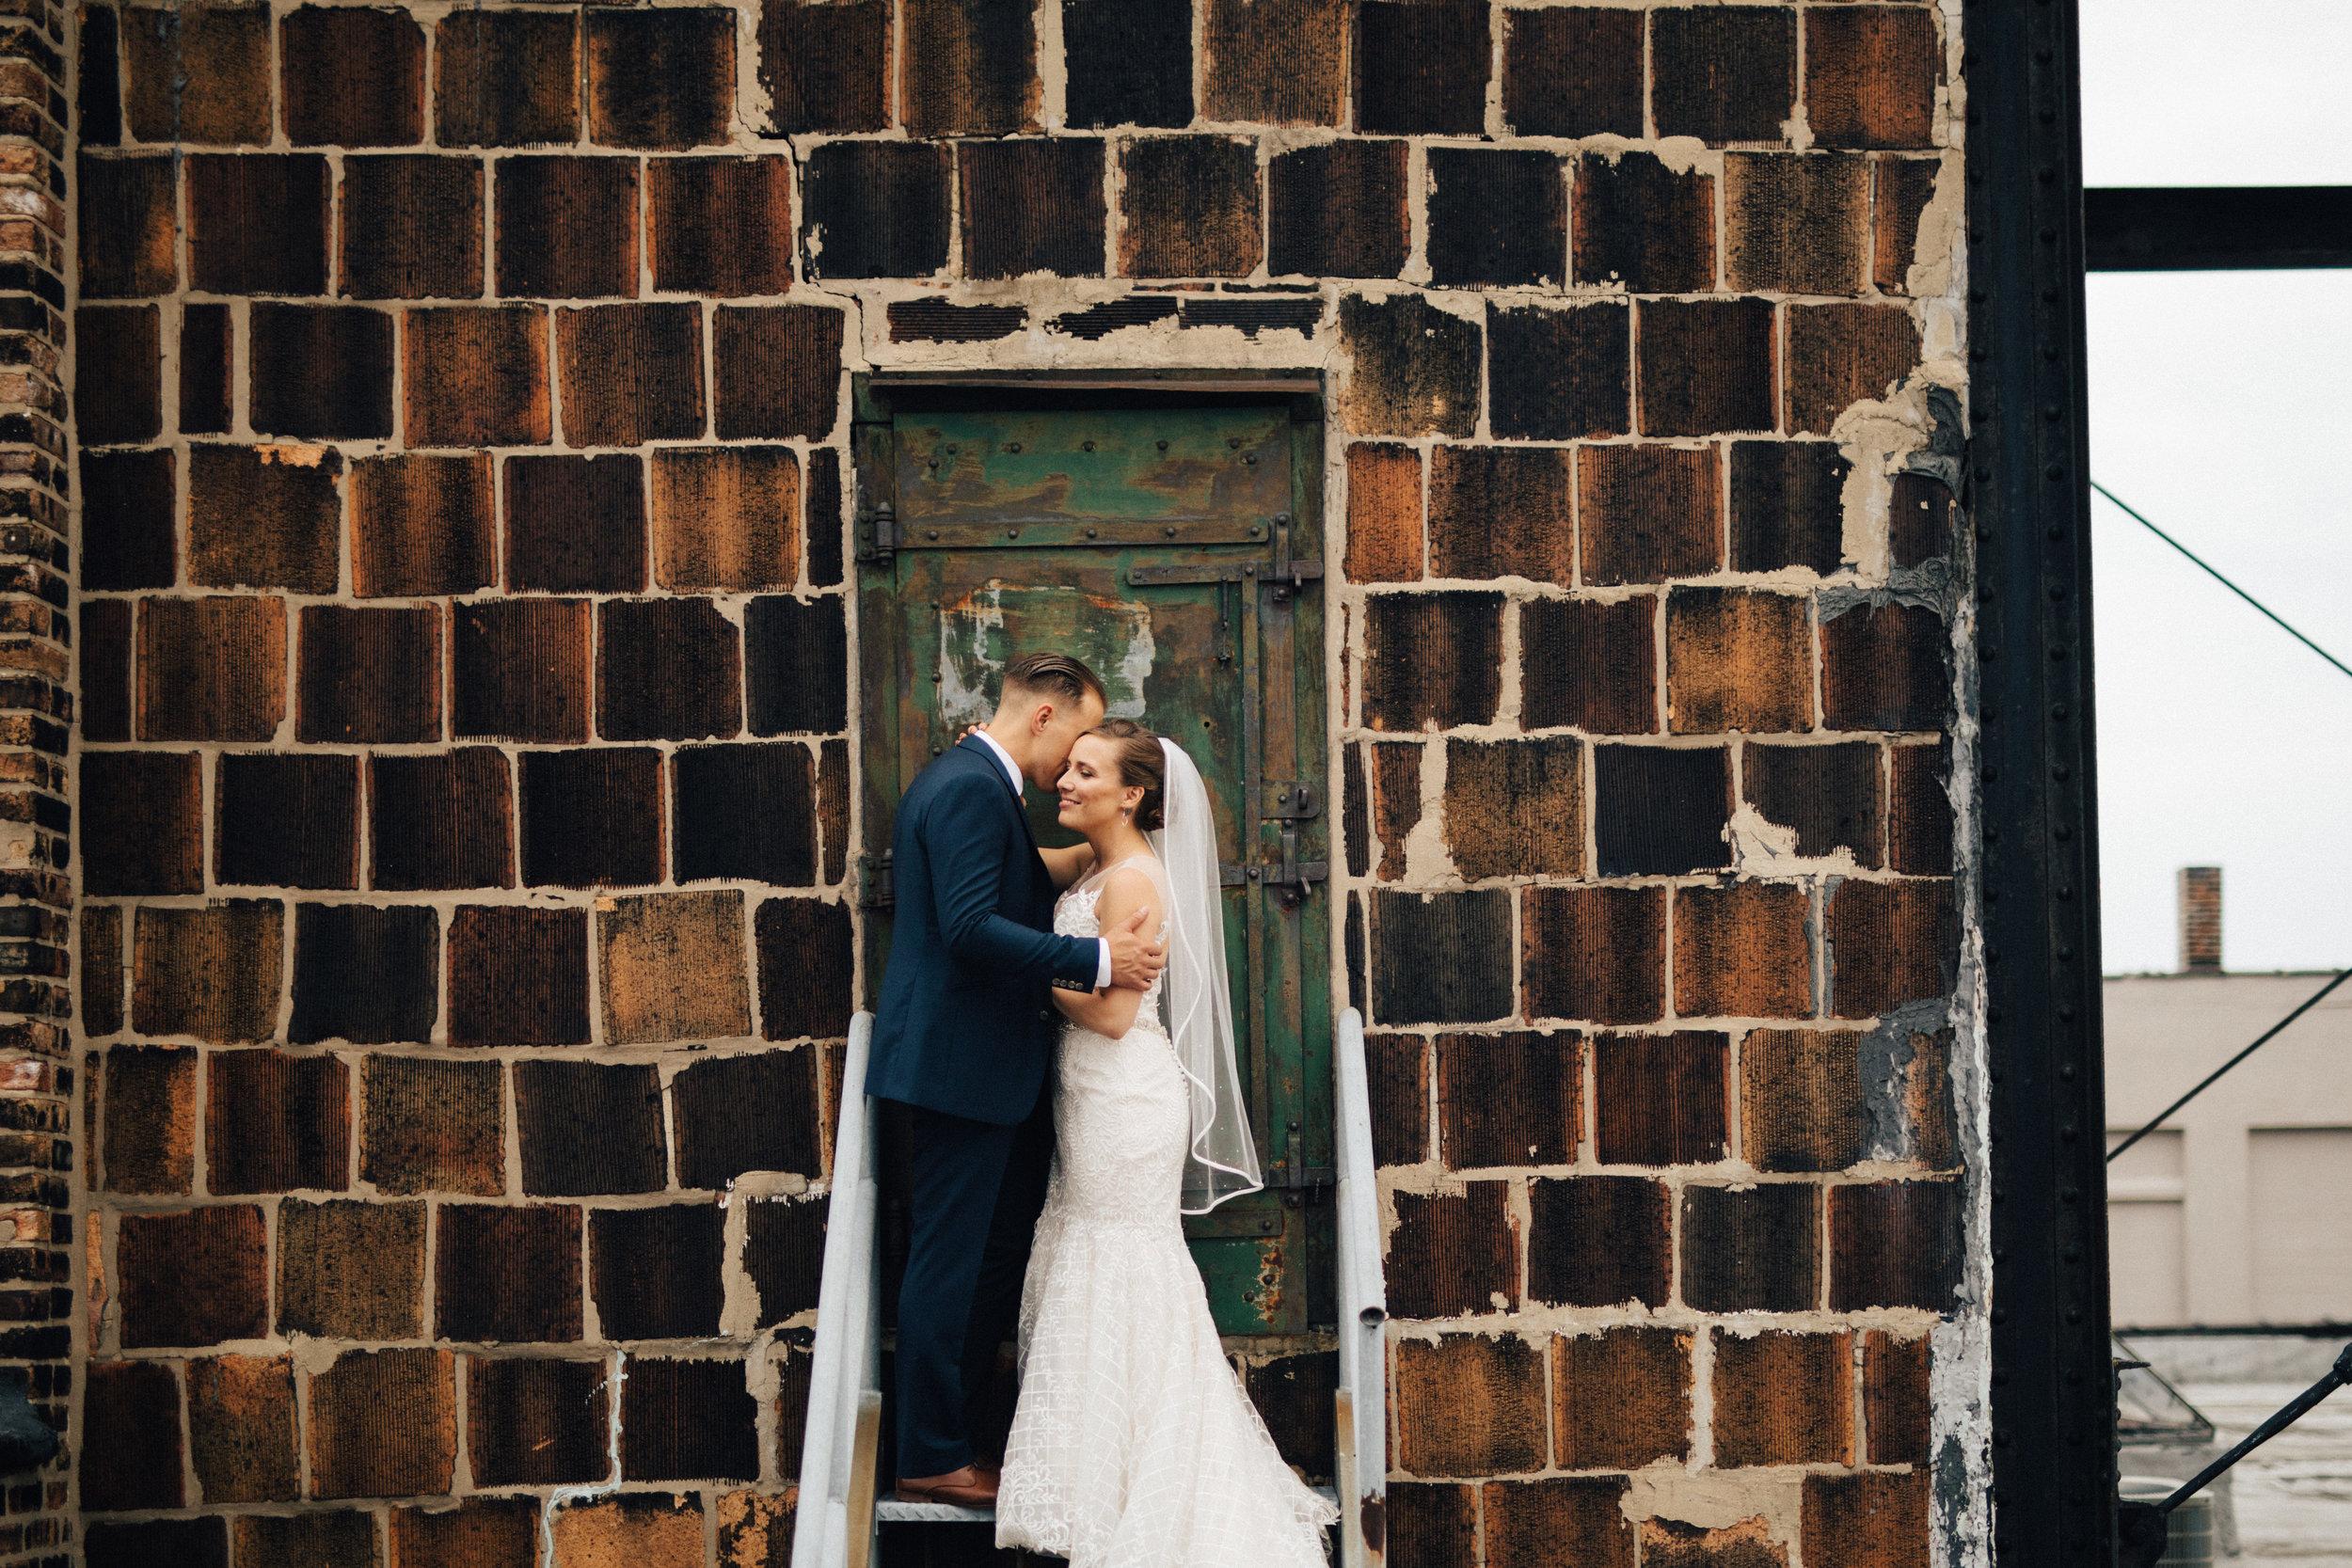 Vintage Wedding_Polly C Photography_20171726183123.jpg